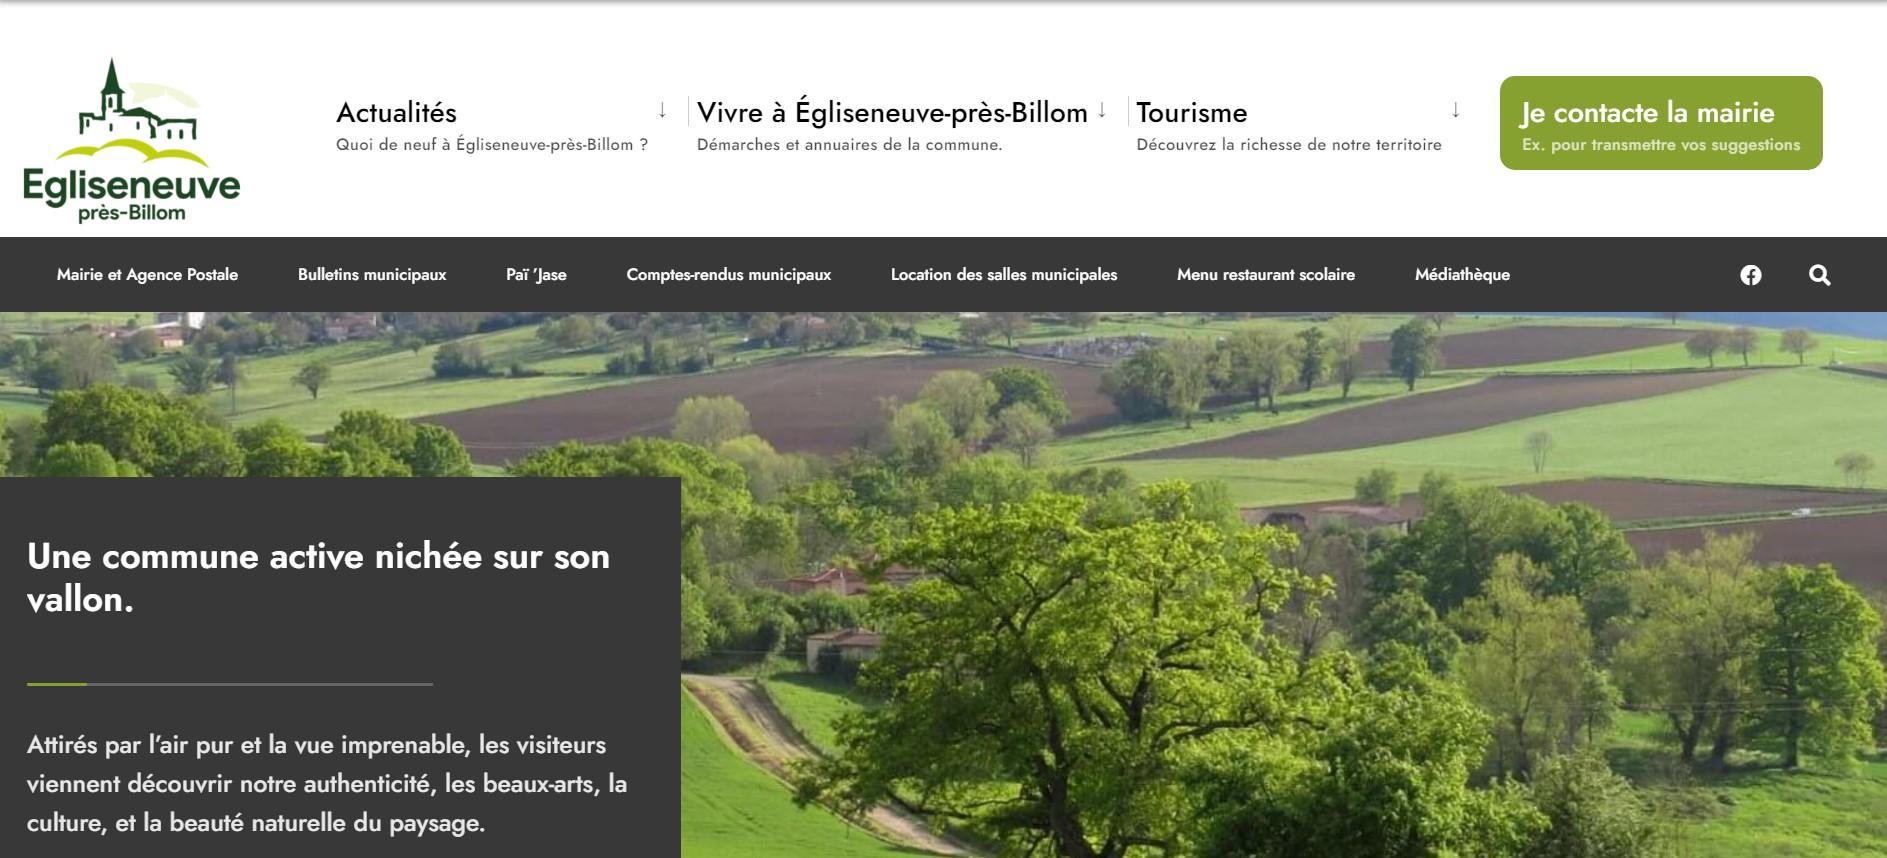 Mairie d'Egliseneuve-près-Billom : accueil